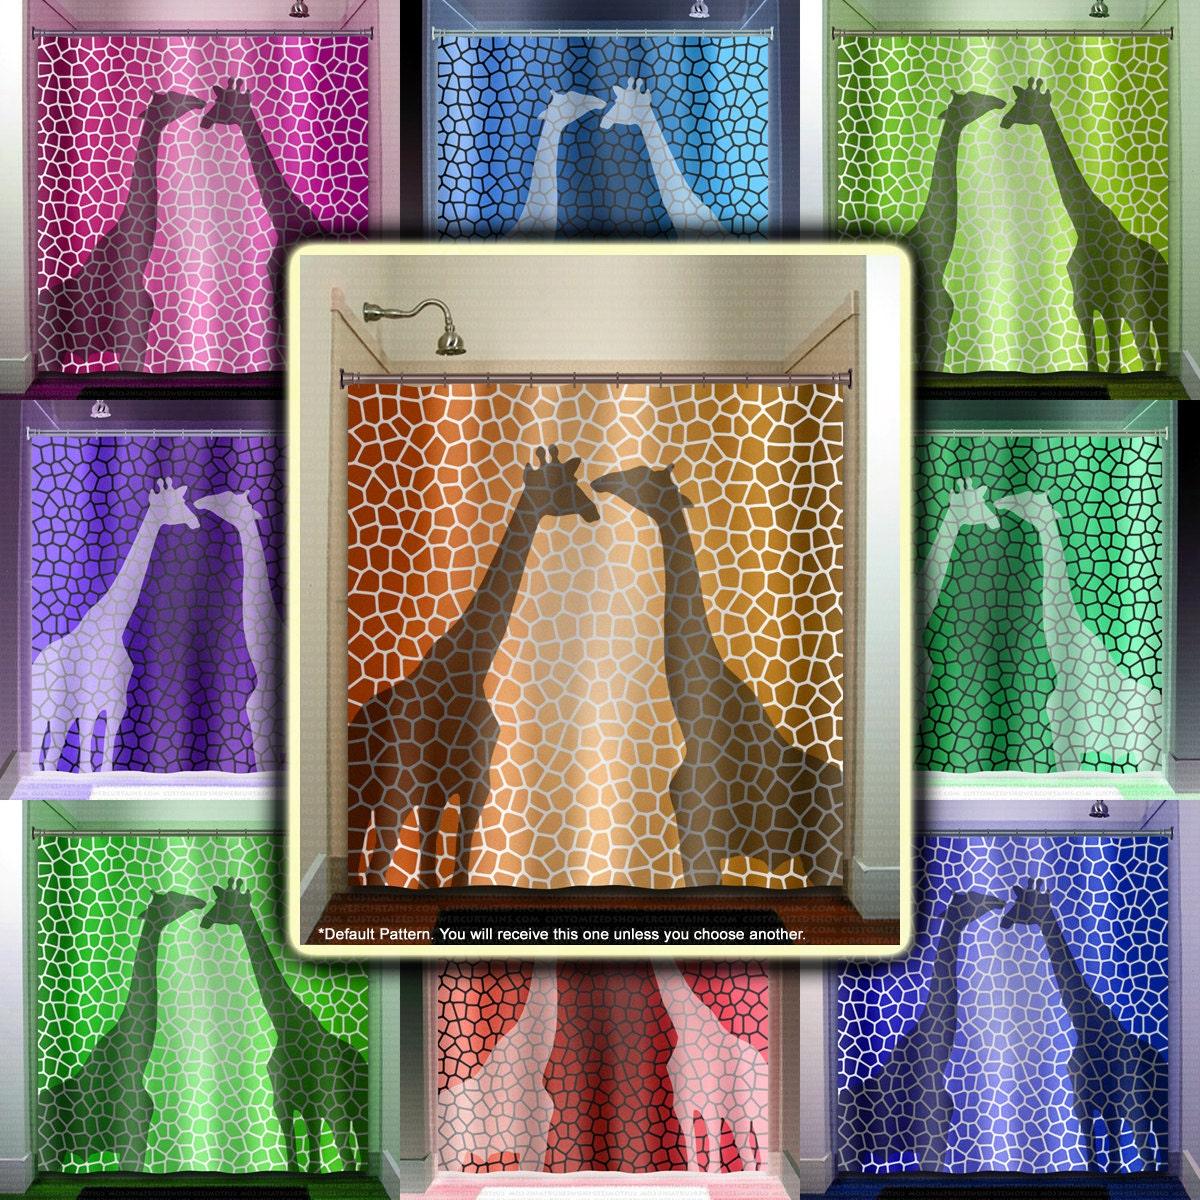 Pattern Giraffe Shower Curtain Bathroom Decor Fabric Kids Bath